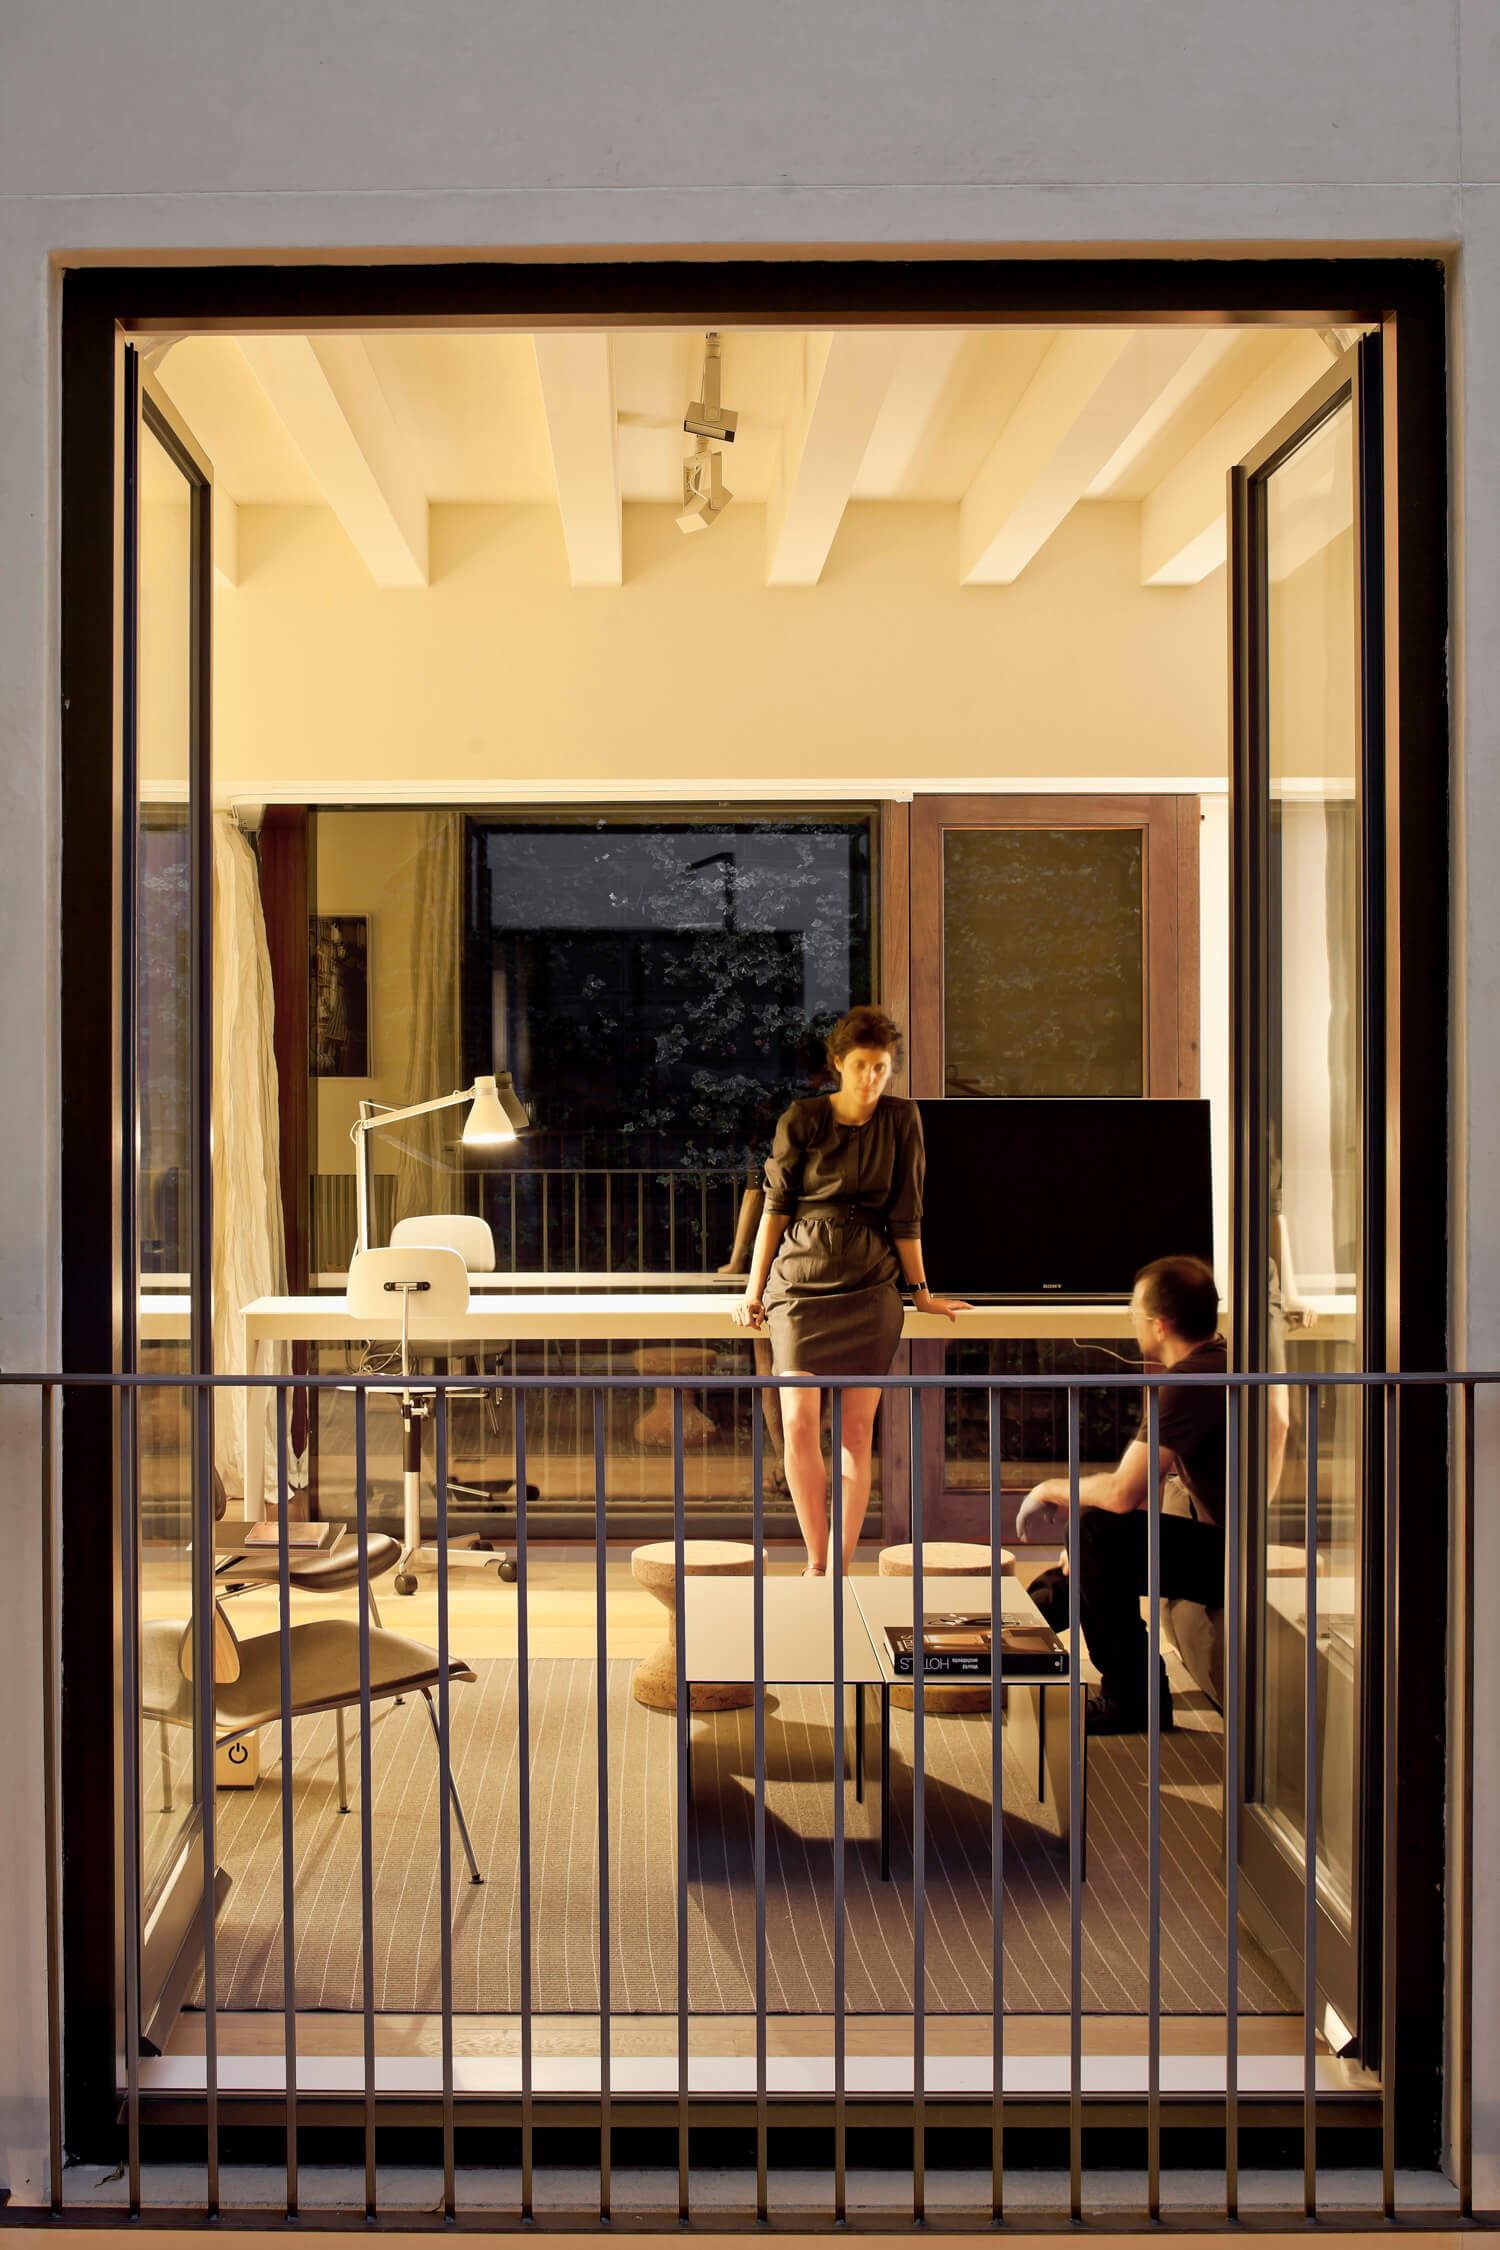 planell-hirsch_arquitectura_rehabilitacion_interiorismo_barcelona_born_mirallers_patio_retrato_adriagoula_2092